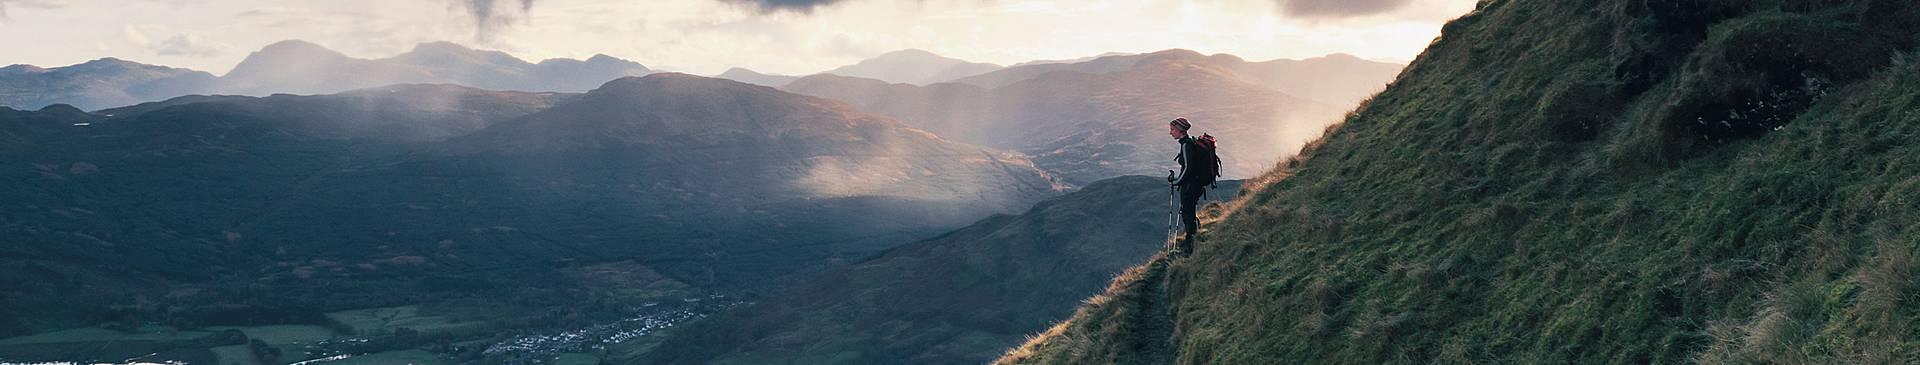 Trekking en Escocia